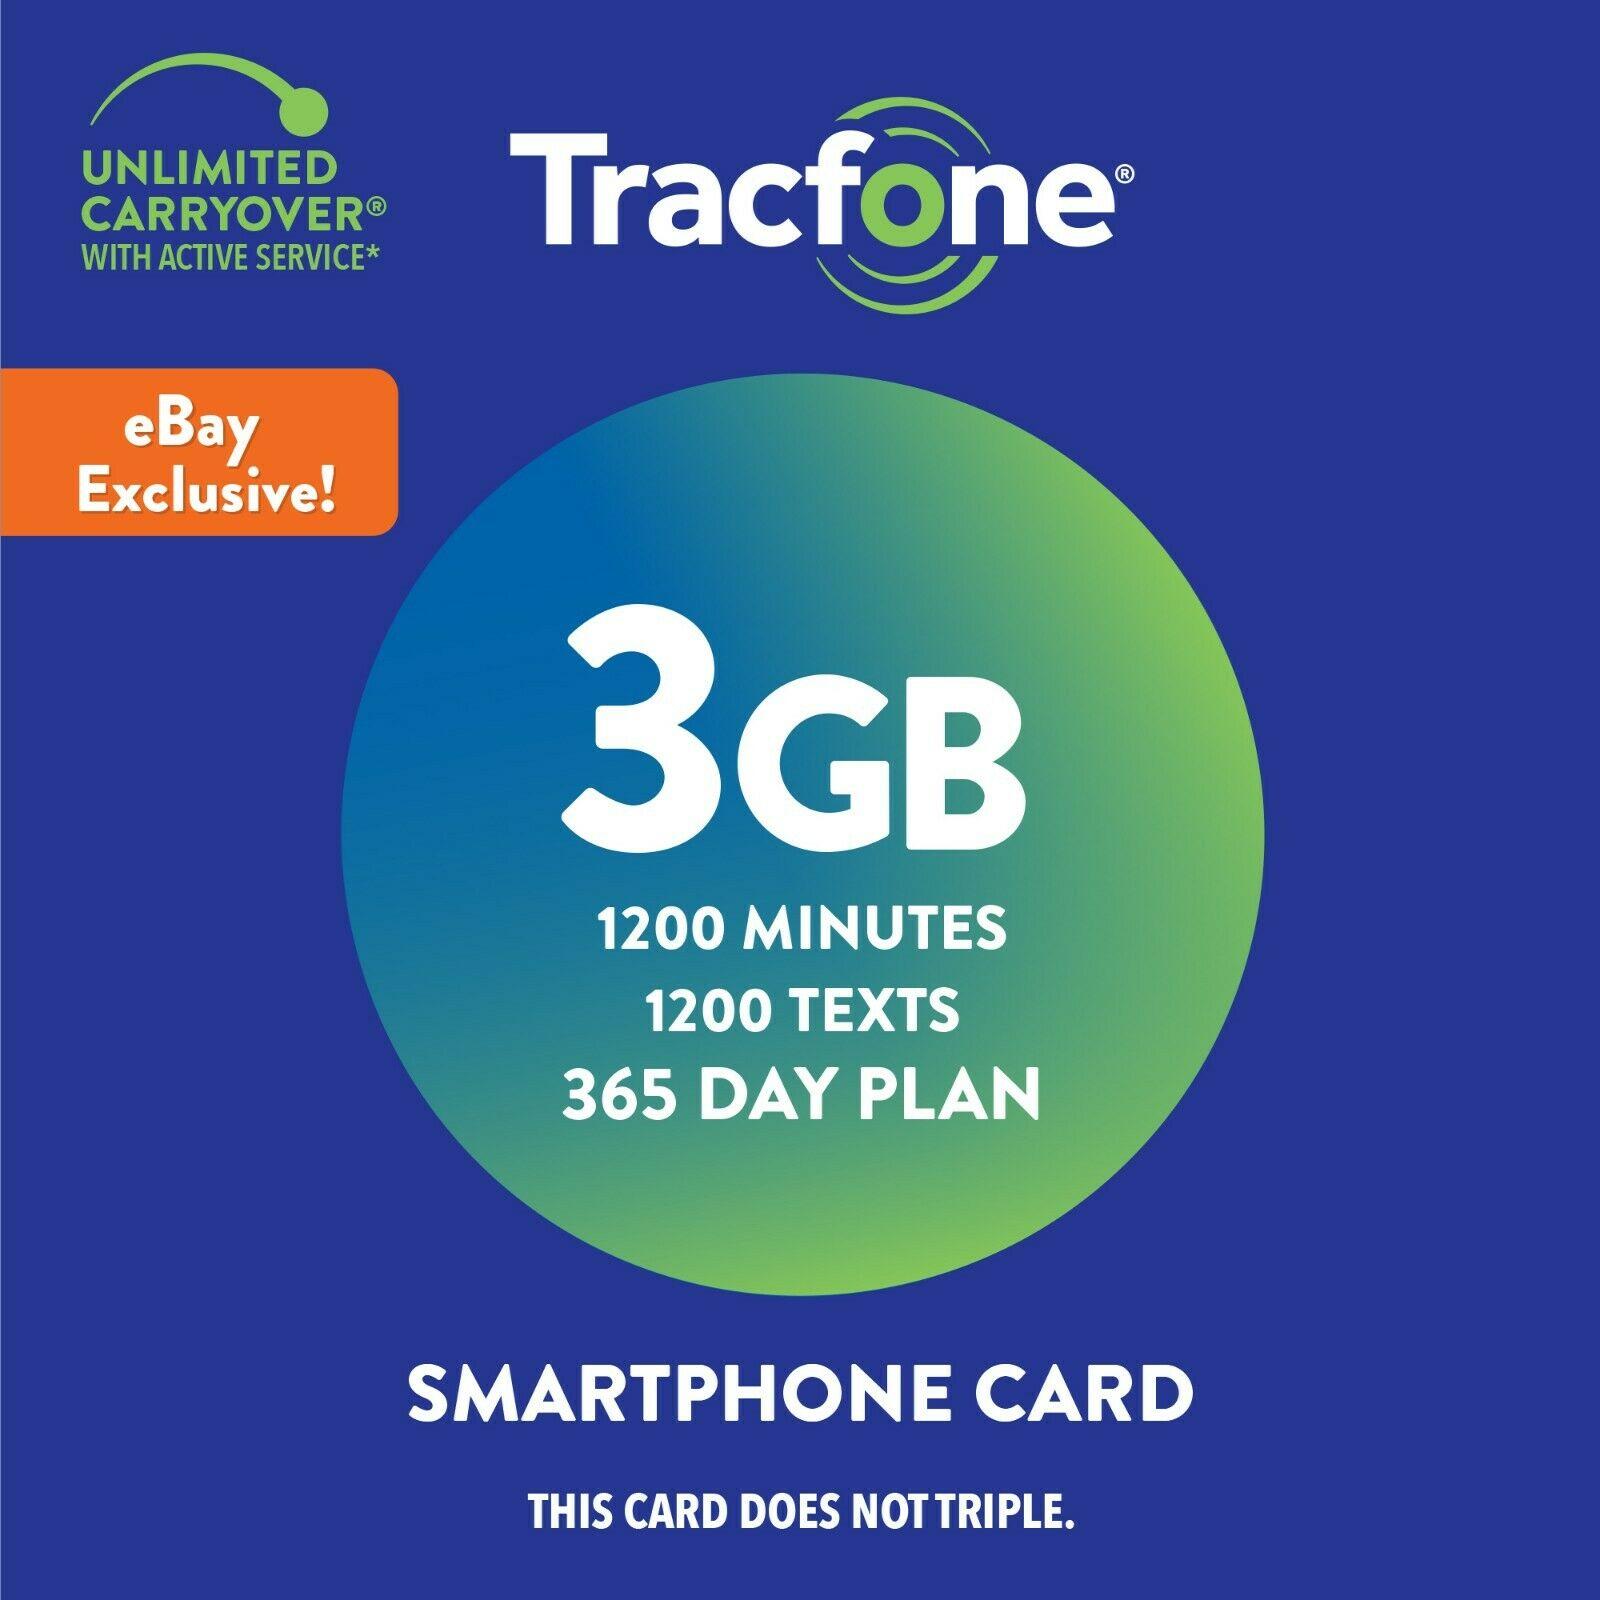 Tracfone Prepaid Smartphone Plan w/ 1200 Min, 1200 Txt & 3GB Data (AT&T or T-Mo)